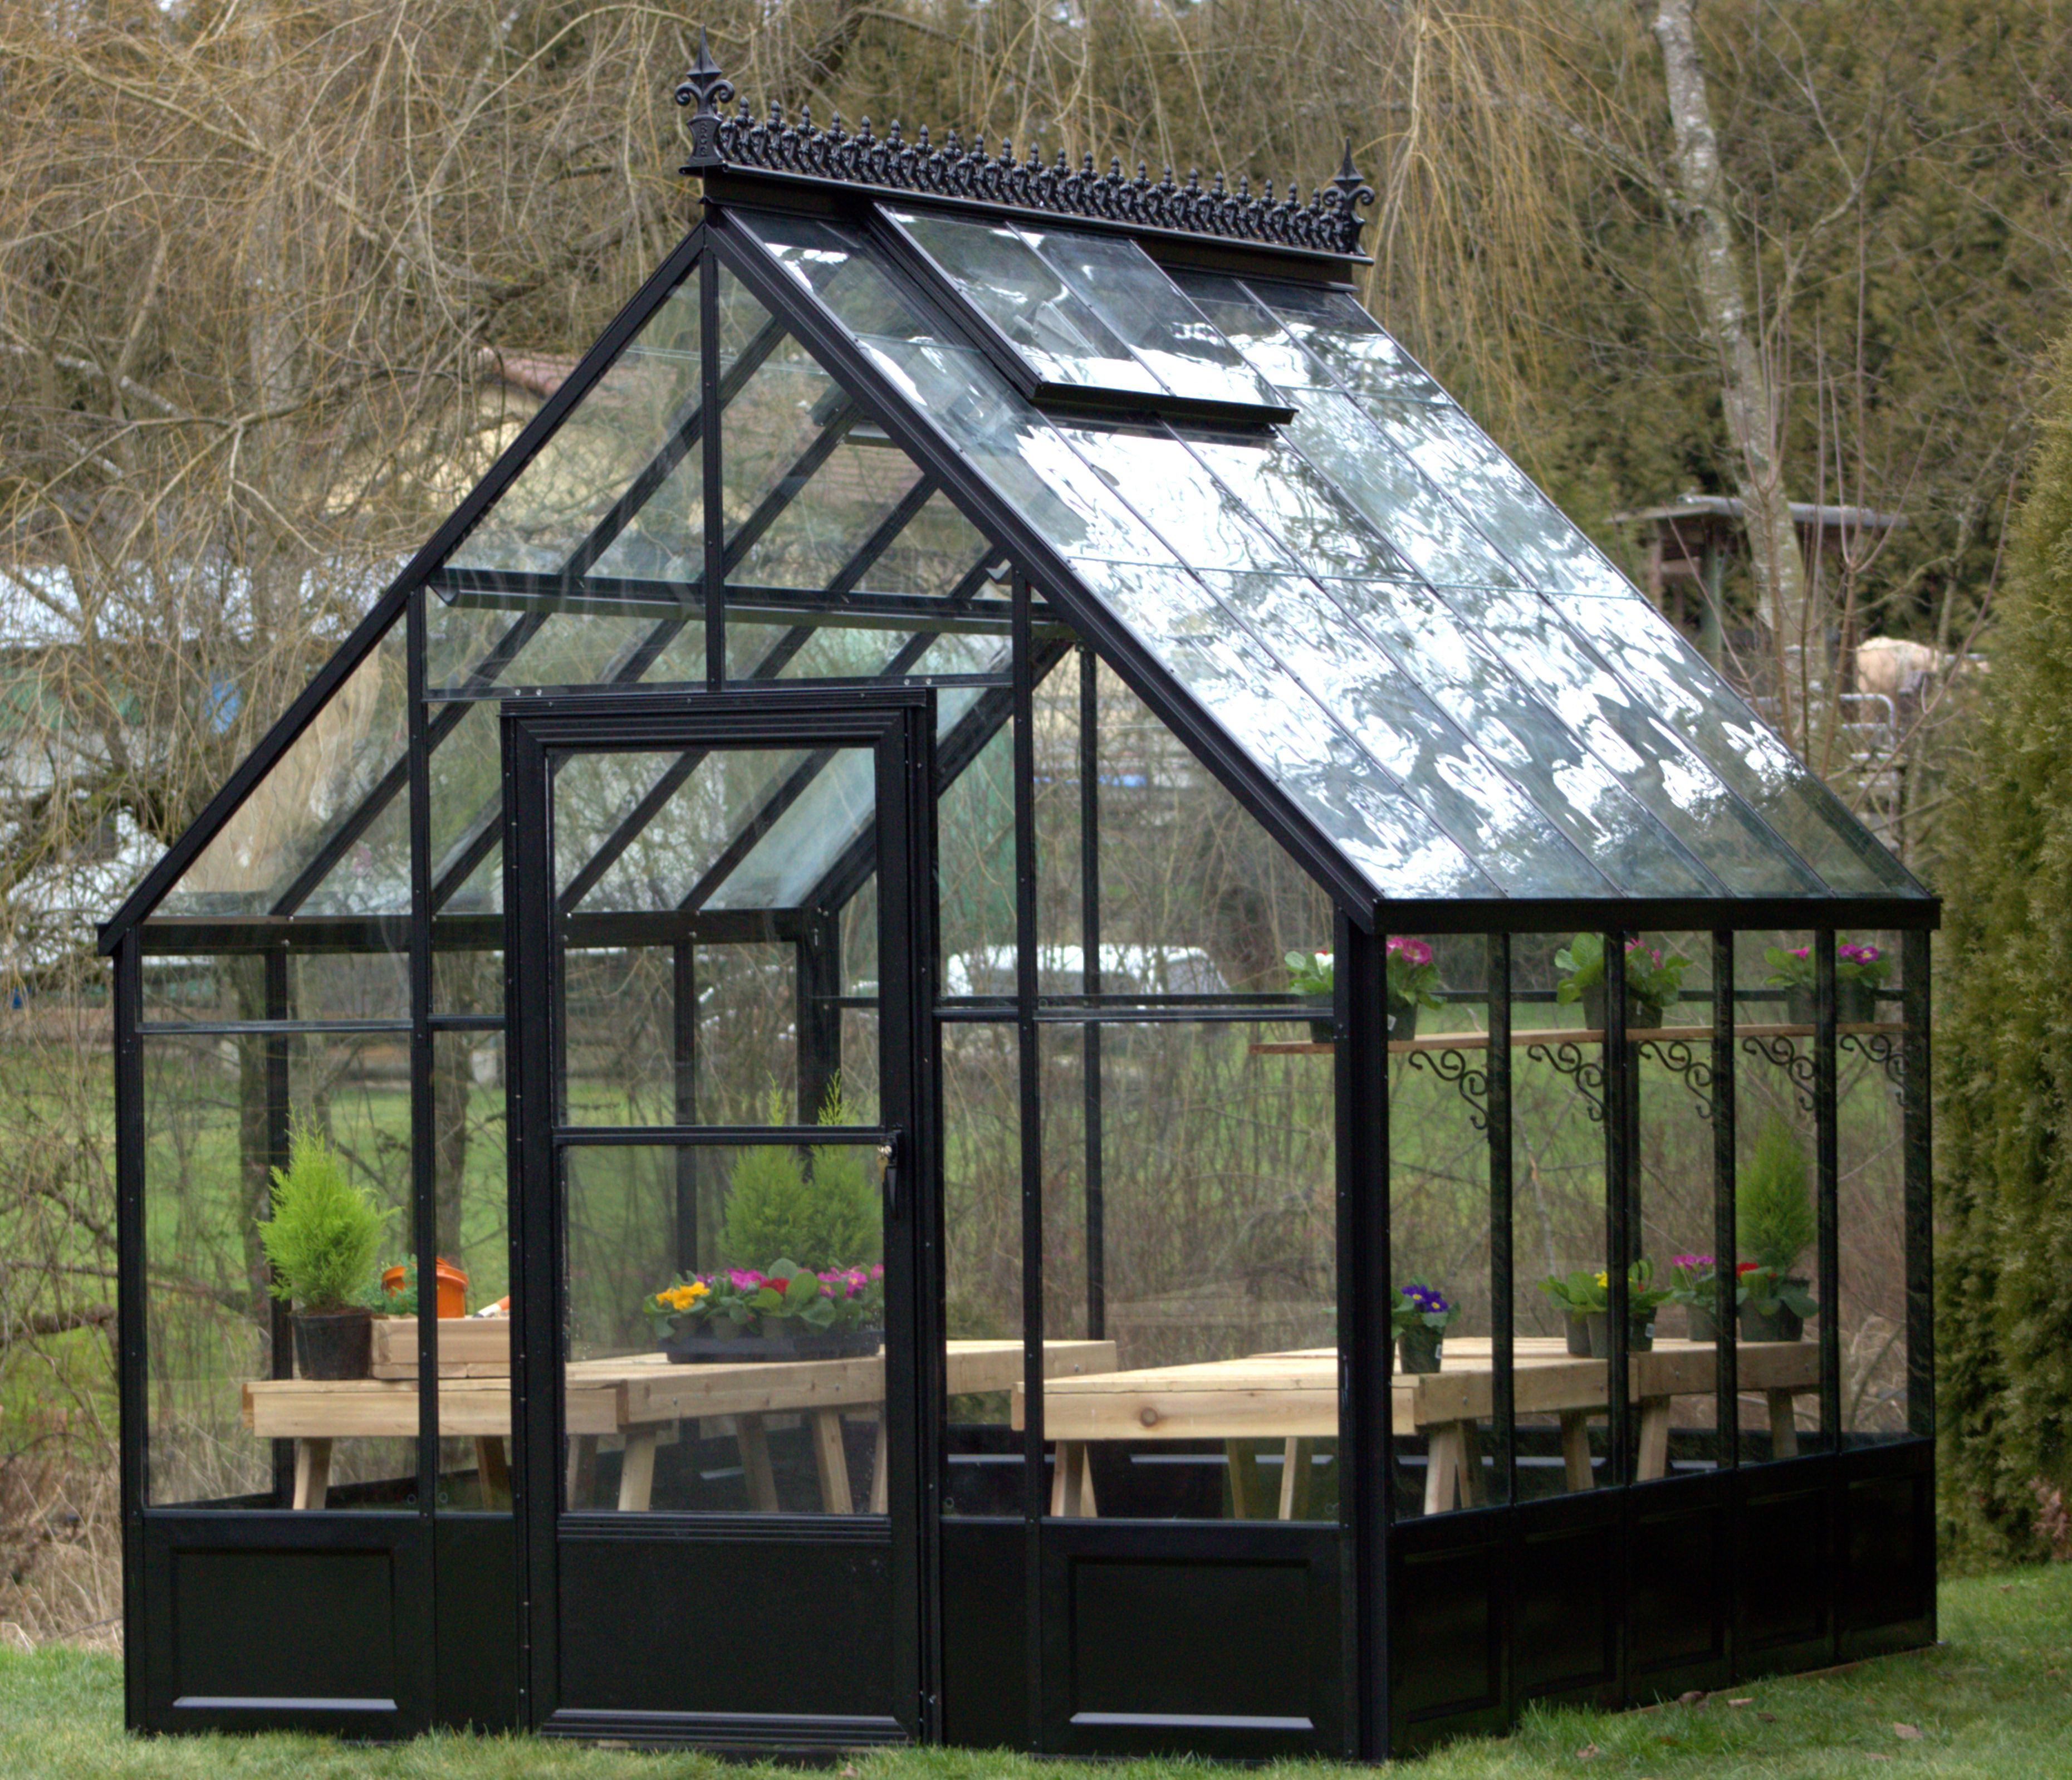 Acadian greenhouse advance greenhouses diy greenhouse